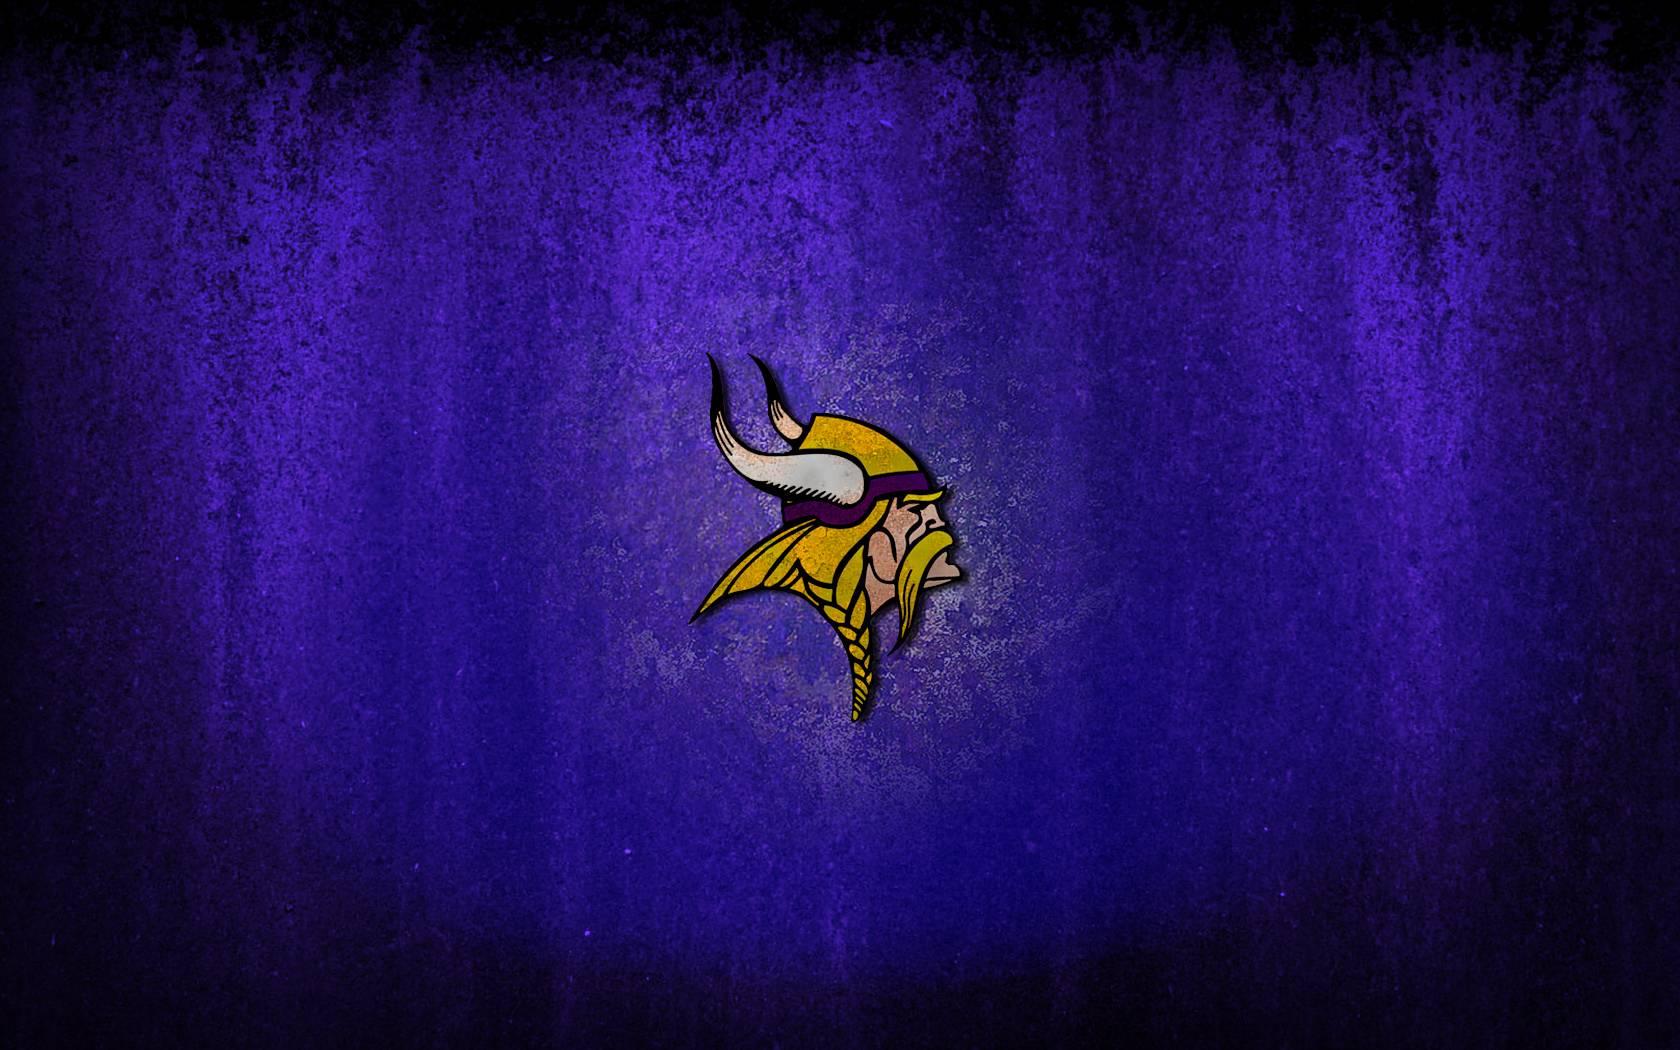 Minnesota Vikings Backgrounds - Wallpaper Cave